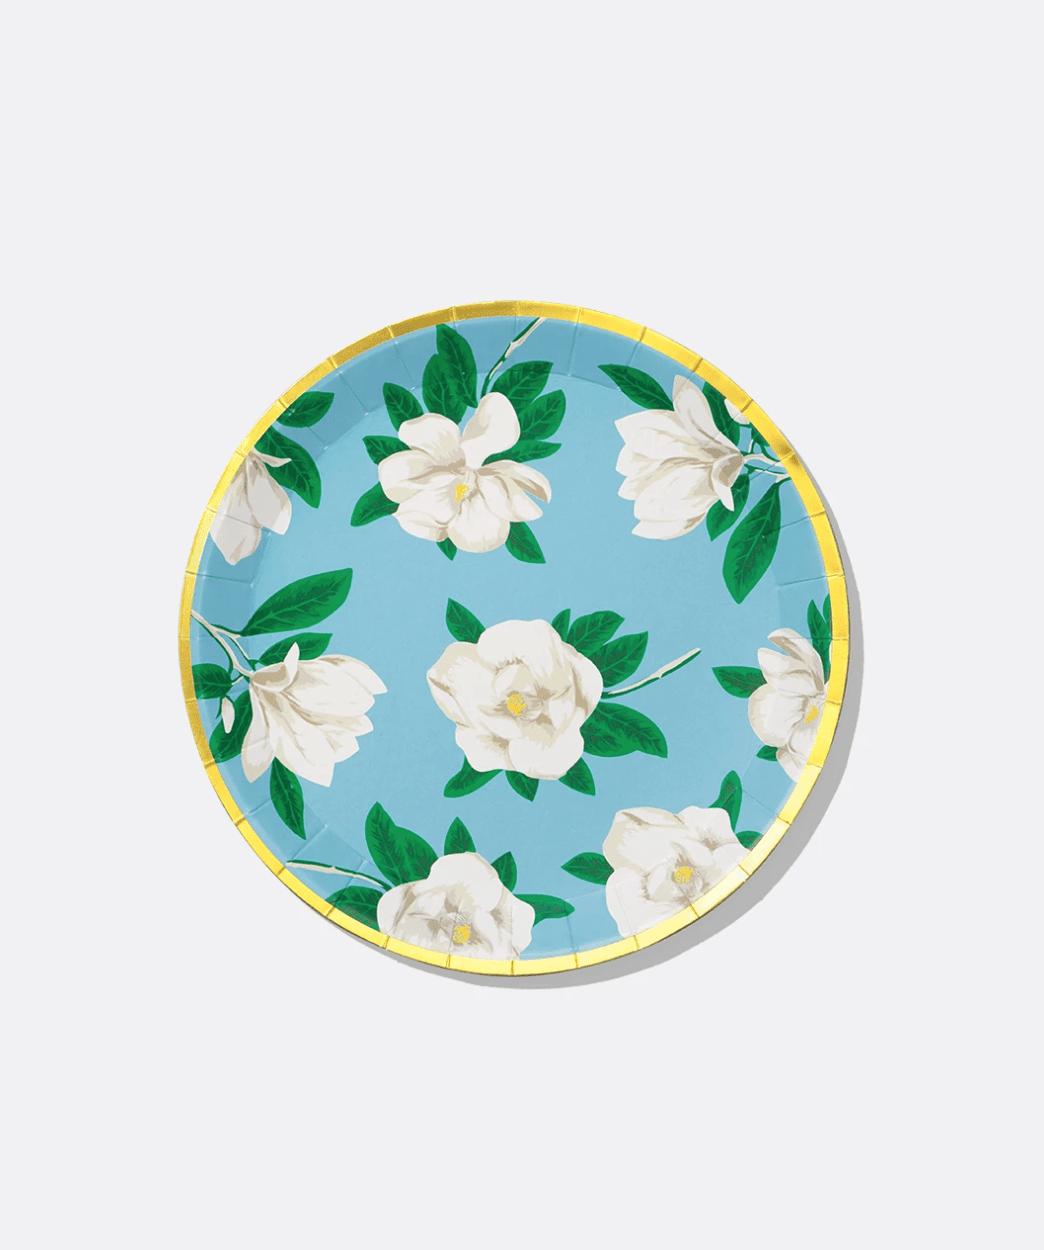 Magnolia paper plate